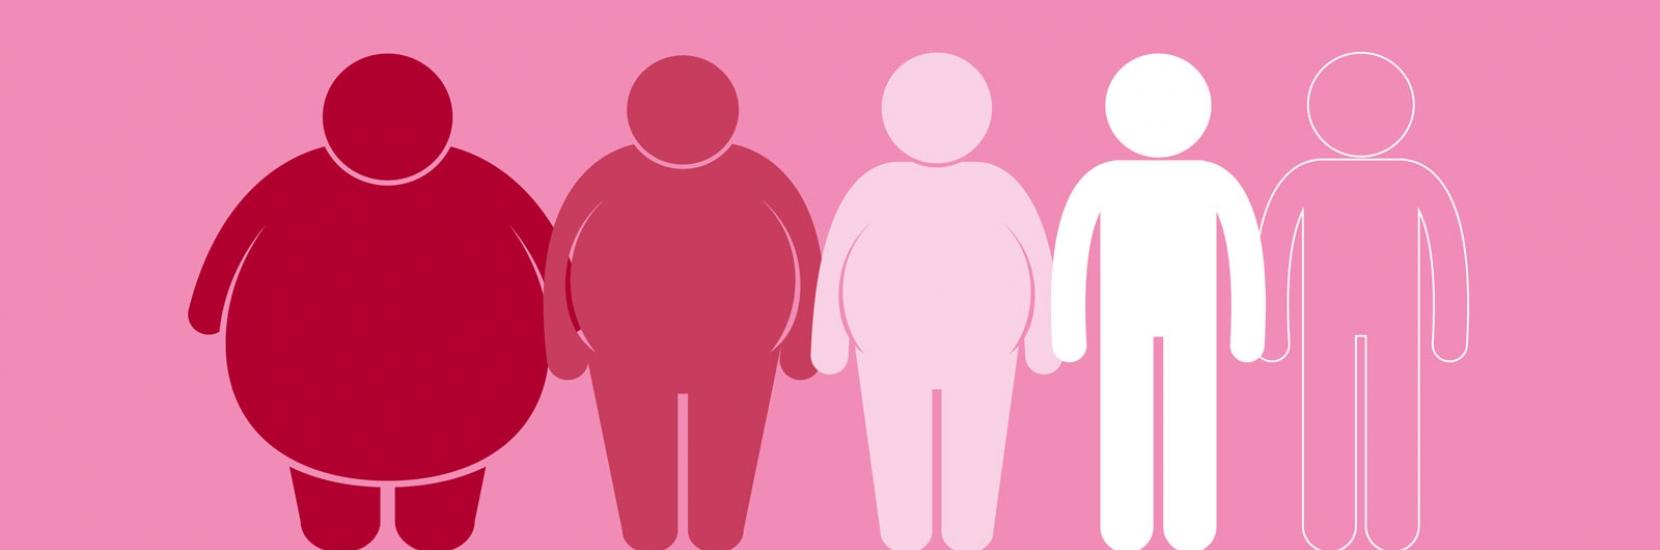 chirurgie obesite en Tunisie